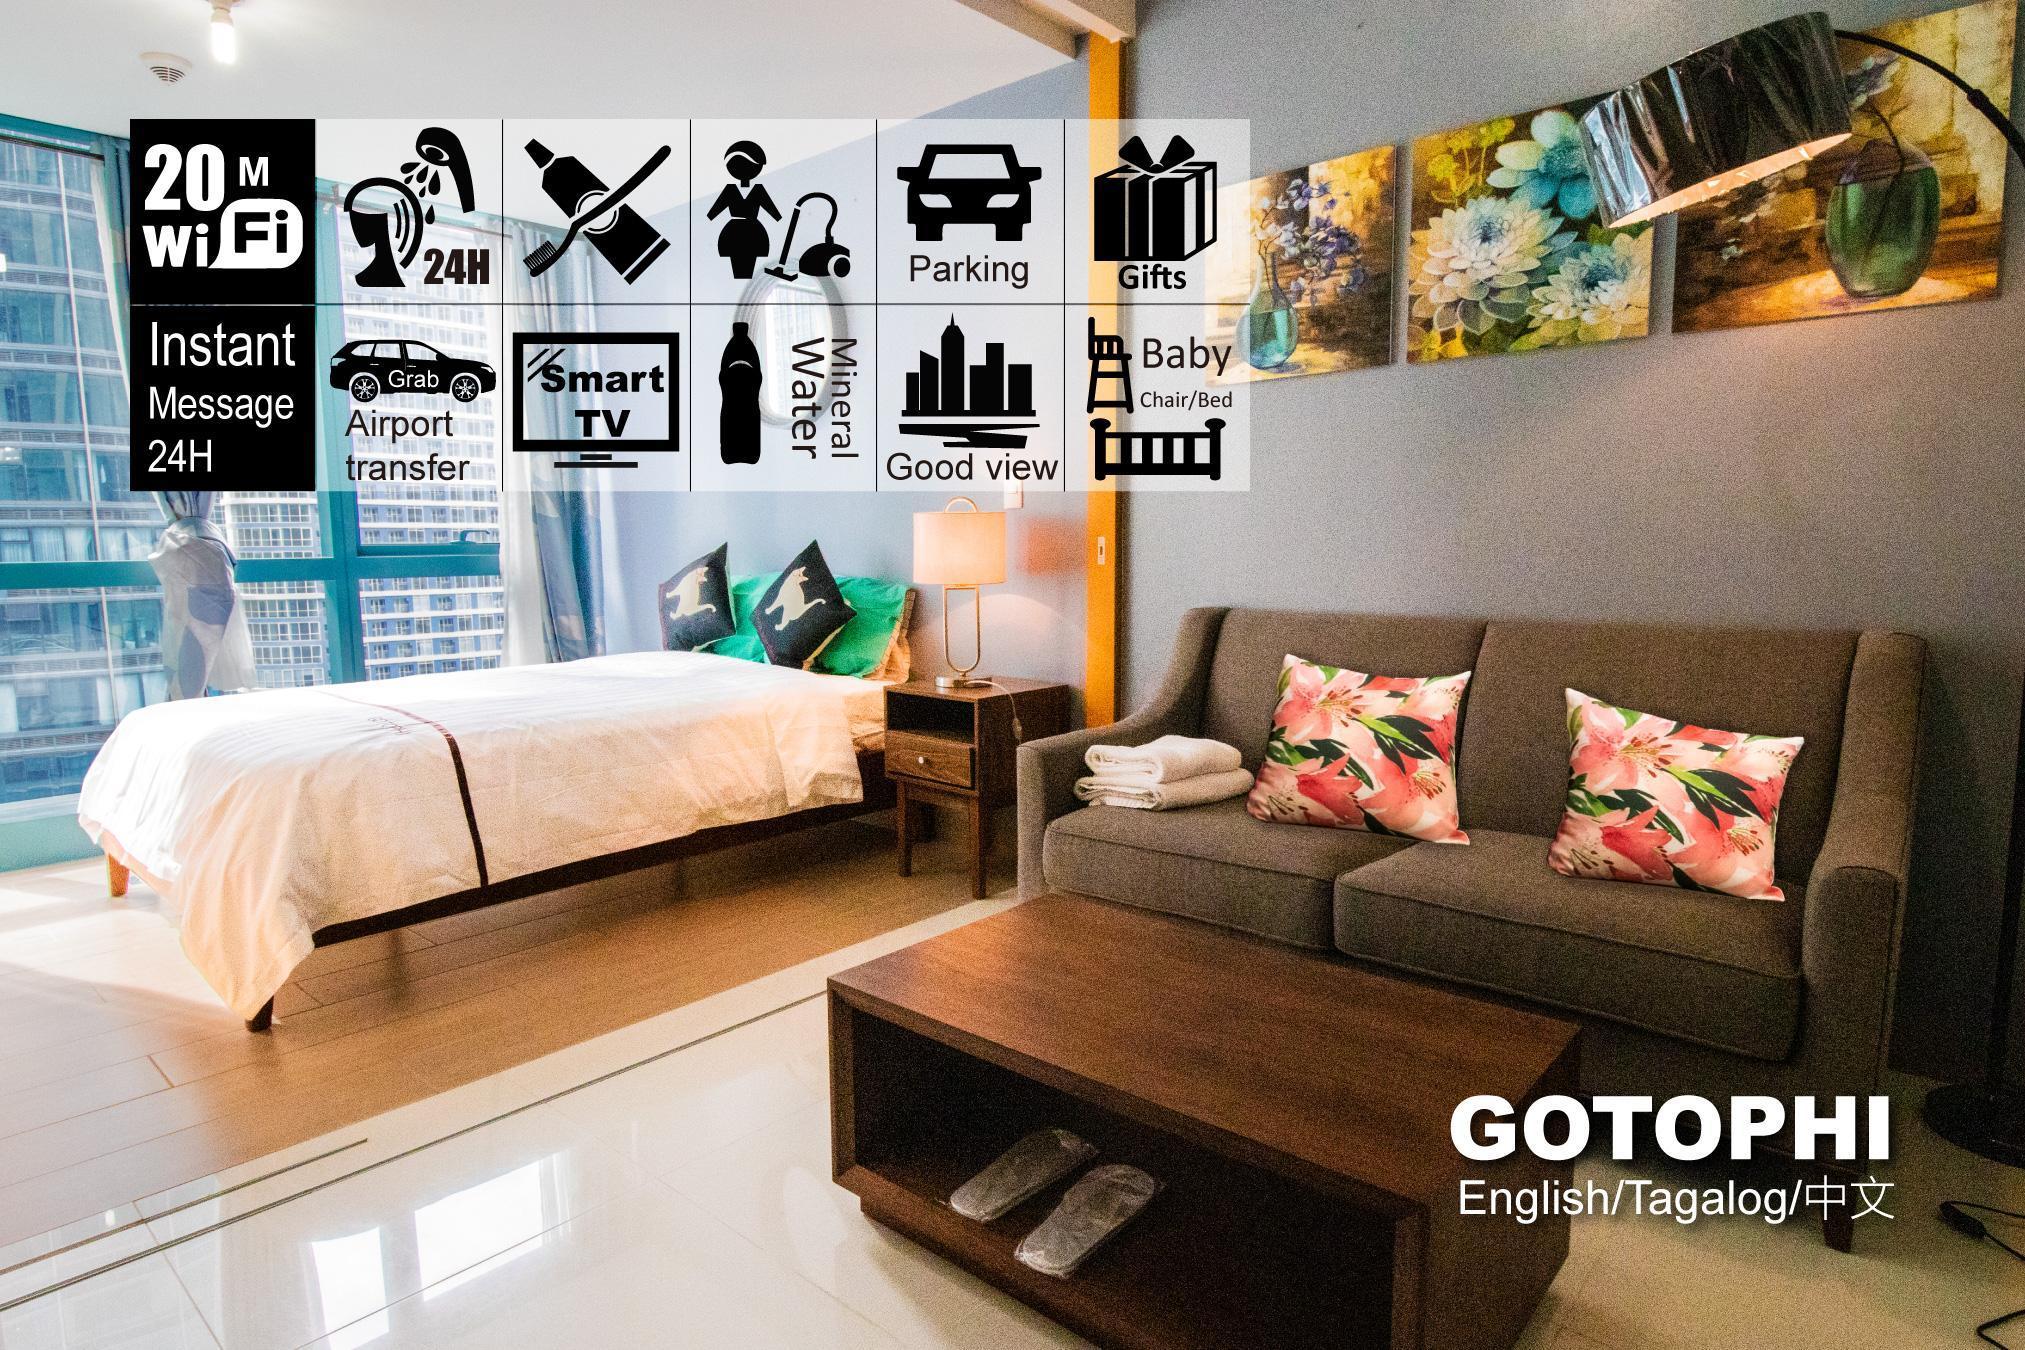 One uptown residence BGC Gotophi 5Star hotel E